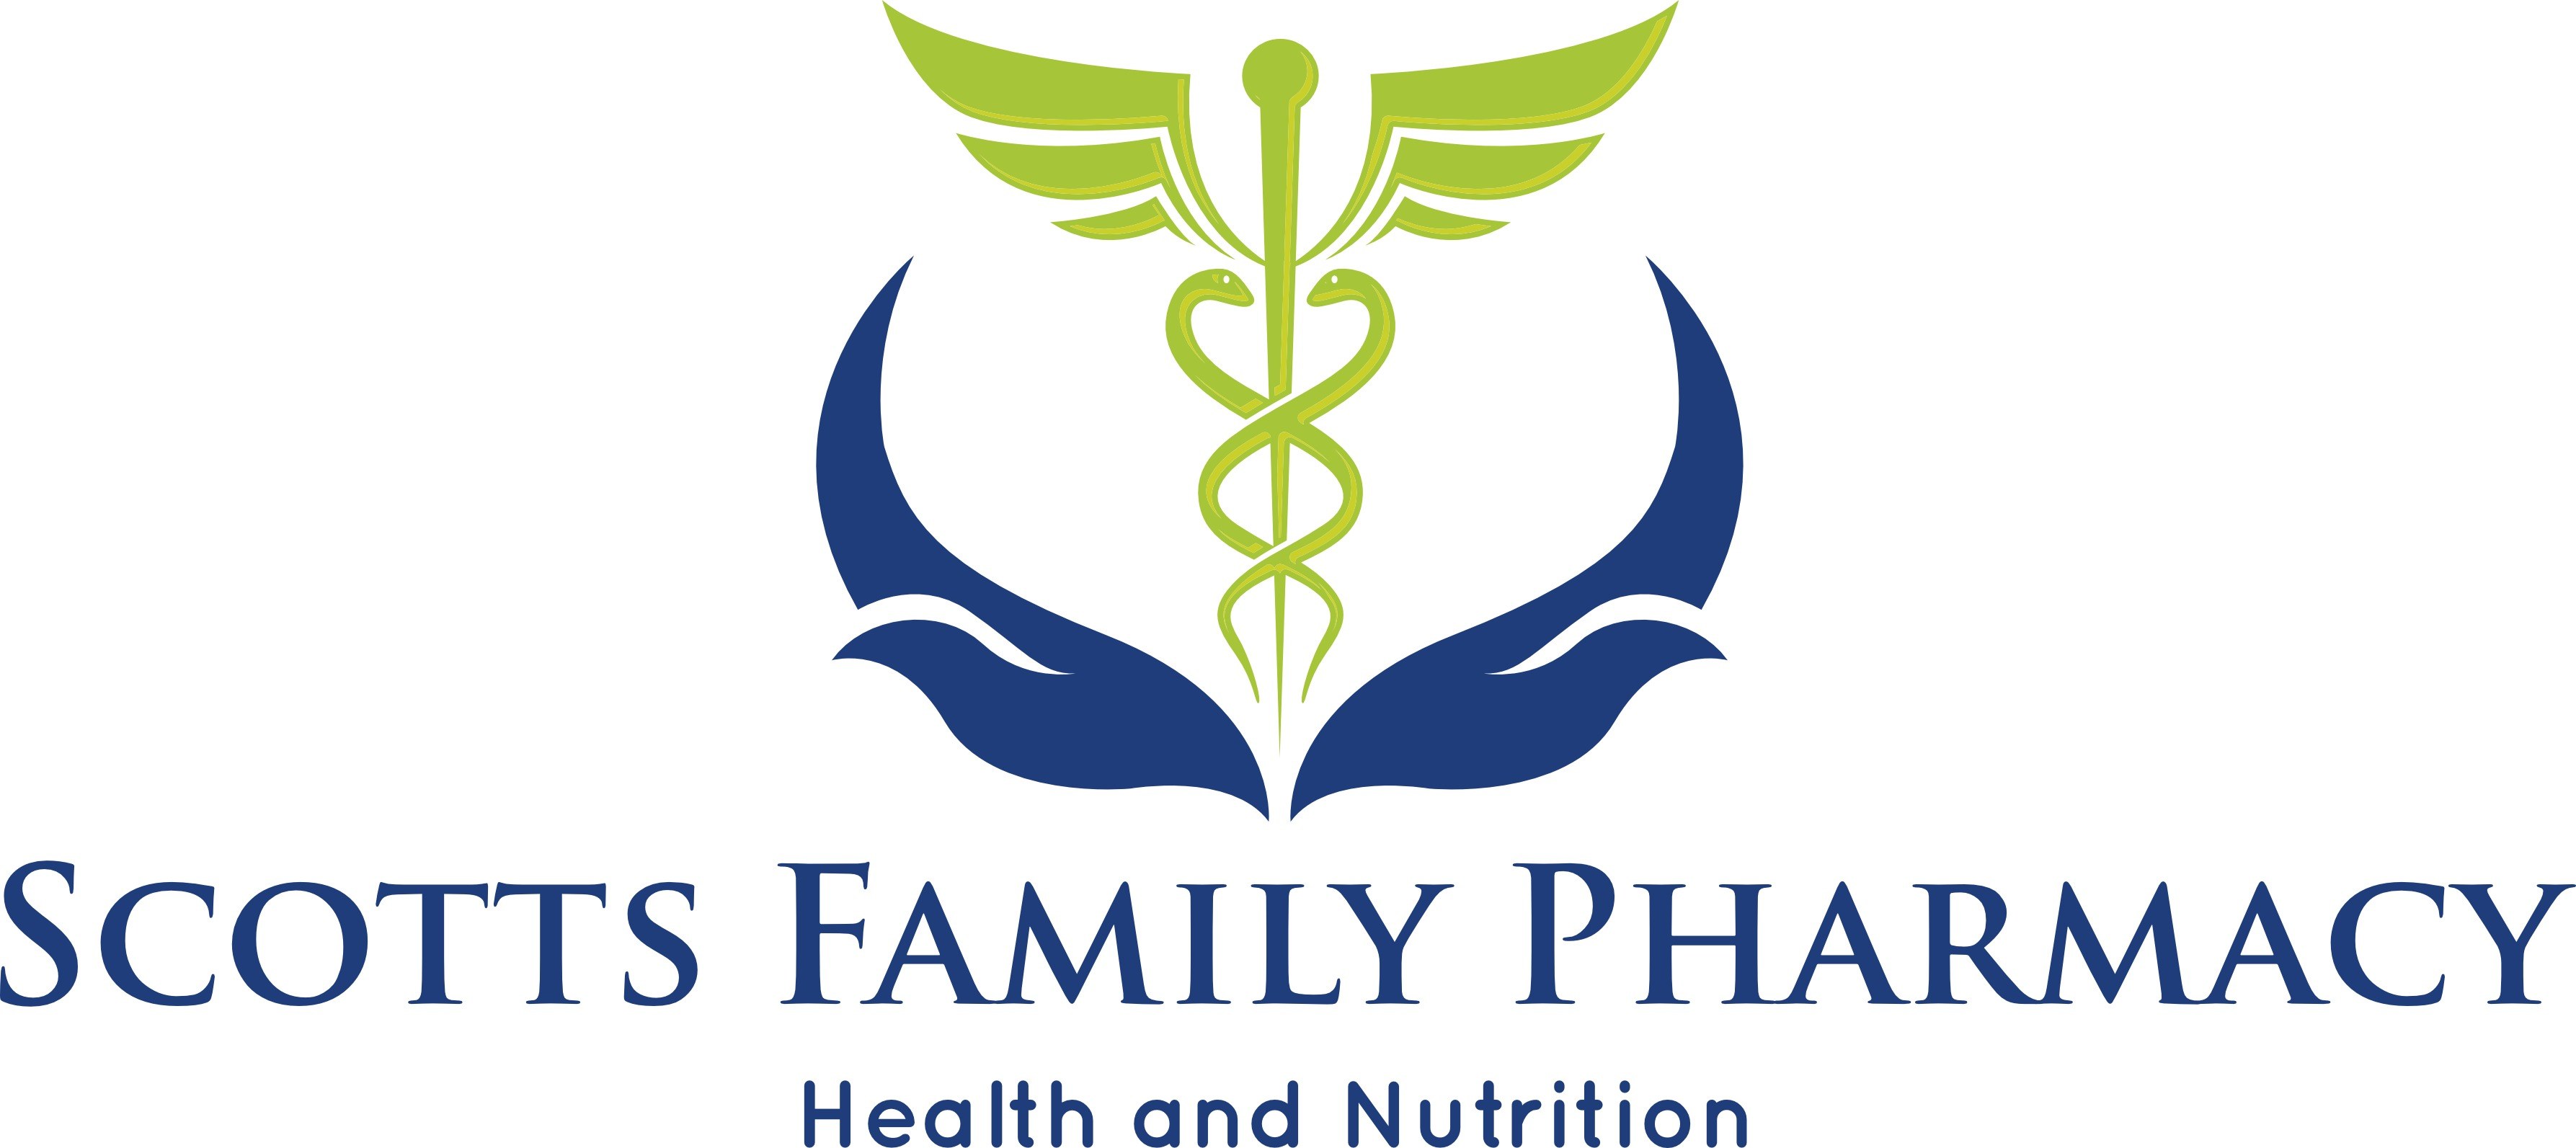 Scotts Family Pharmacy